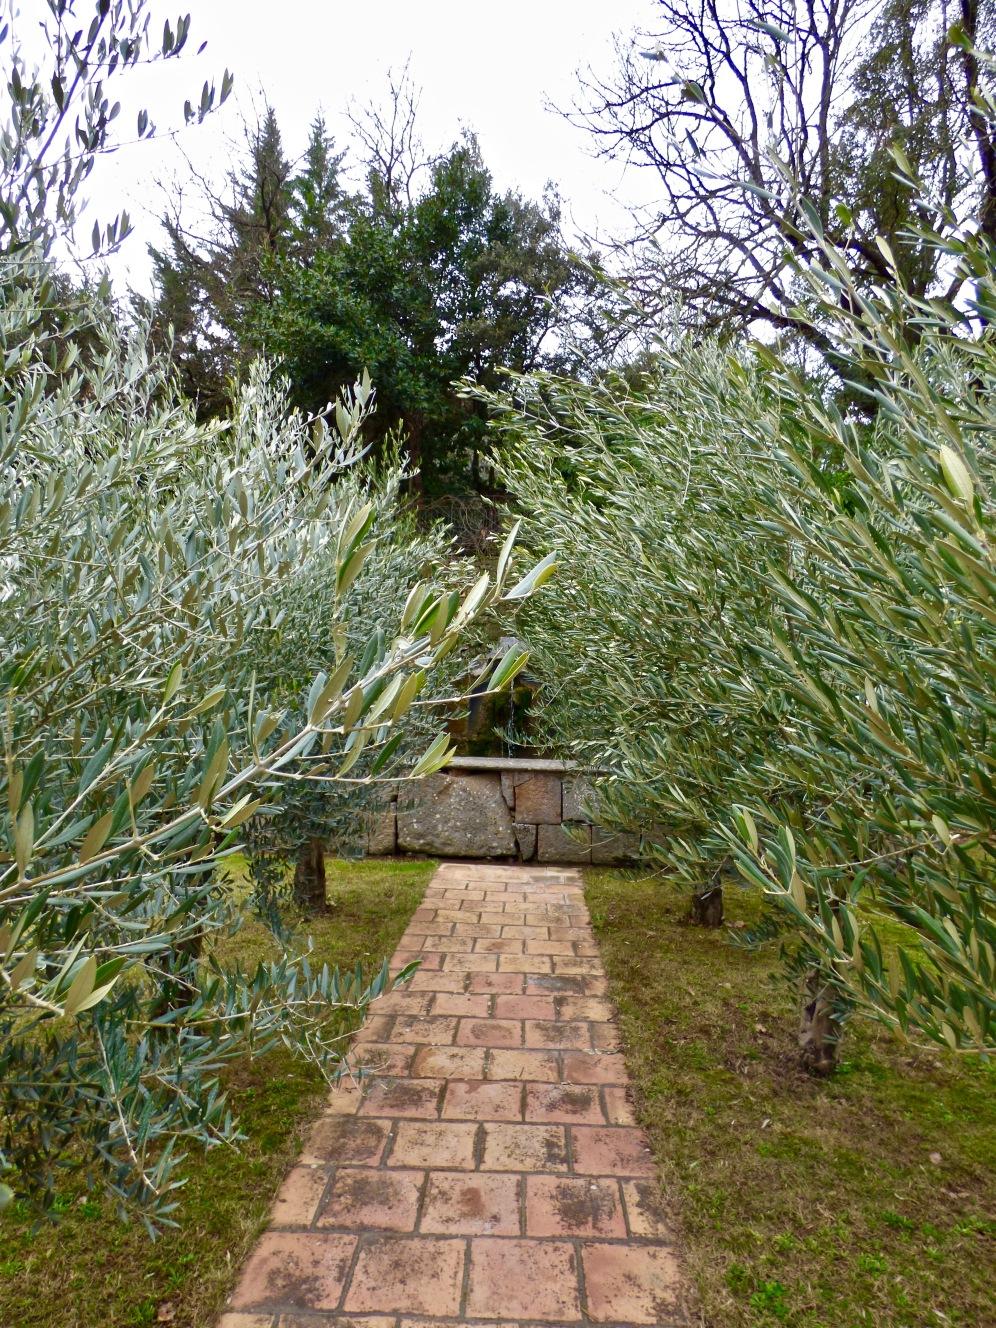 Le bassin et les oliviers ©lepetitlugourmand